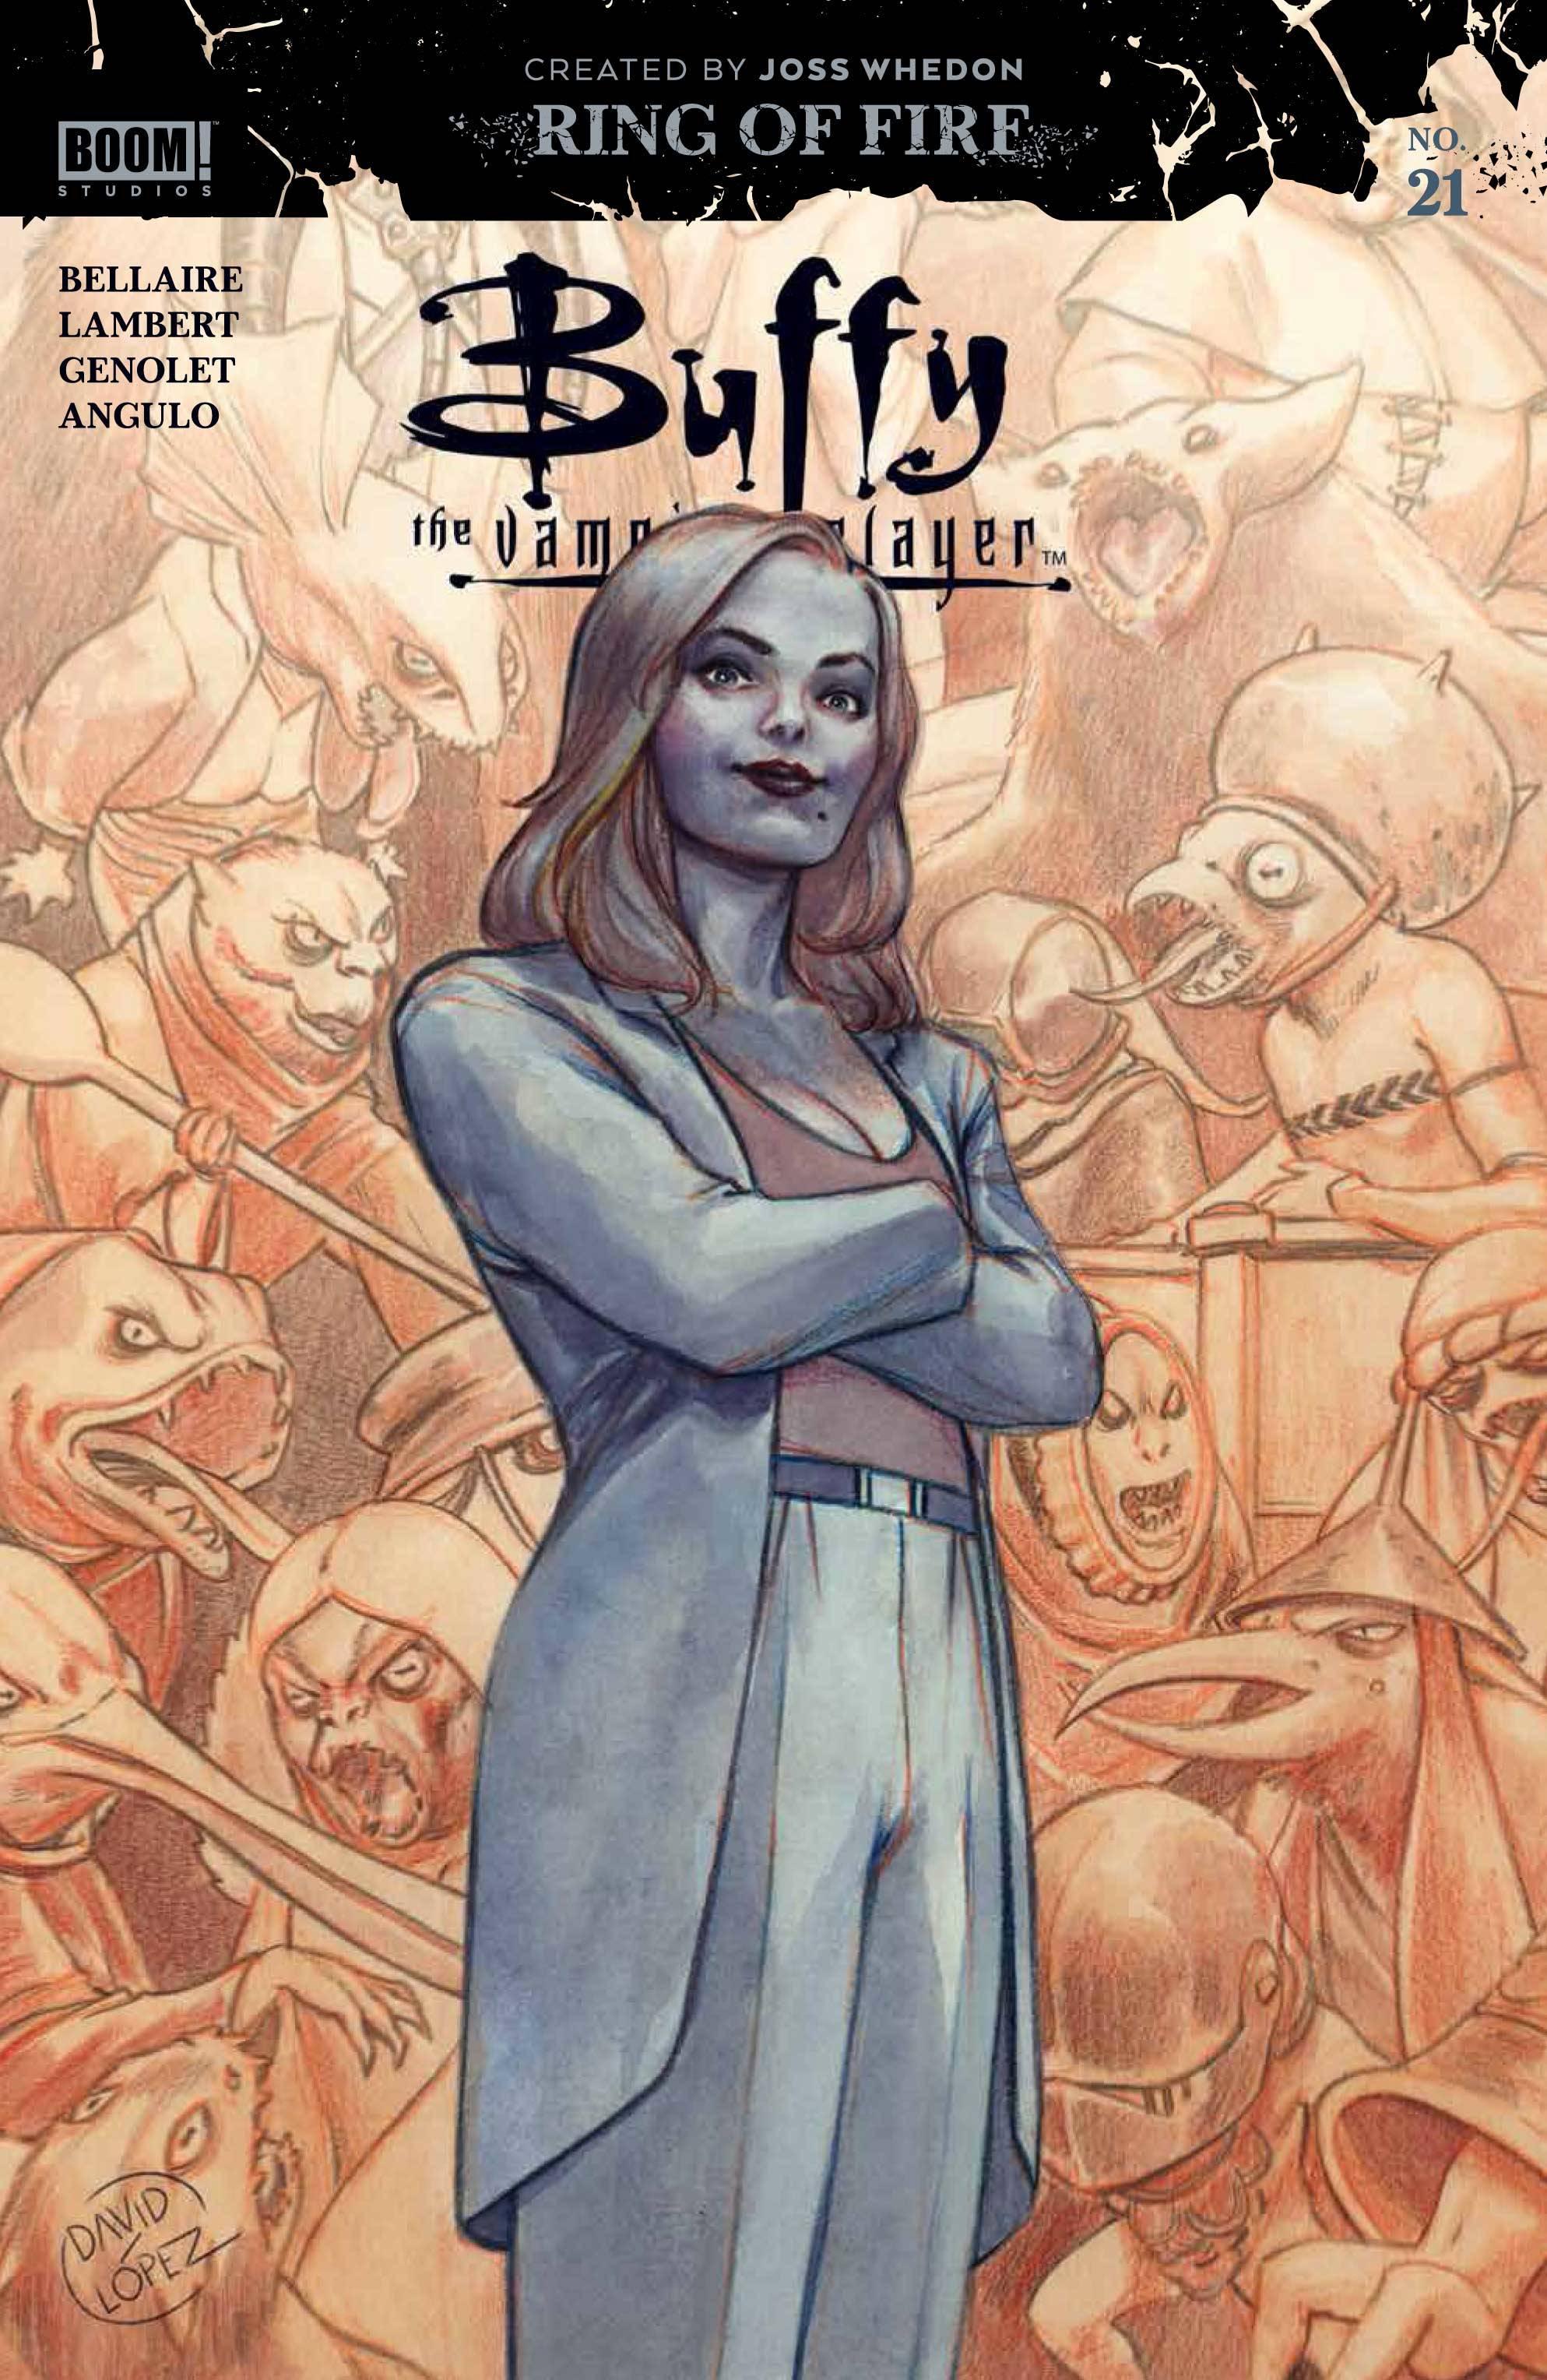 Buffy The Vampire Slayer #21 (2021)